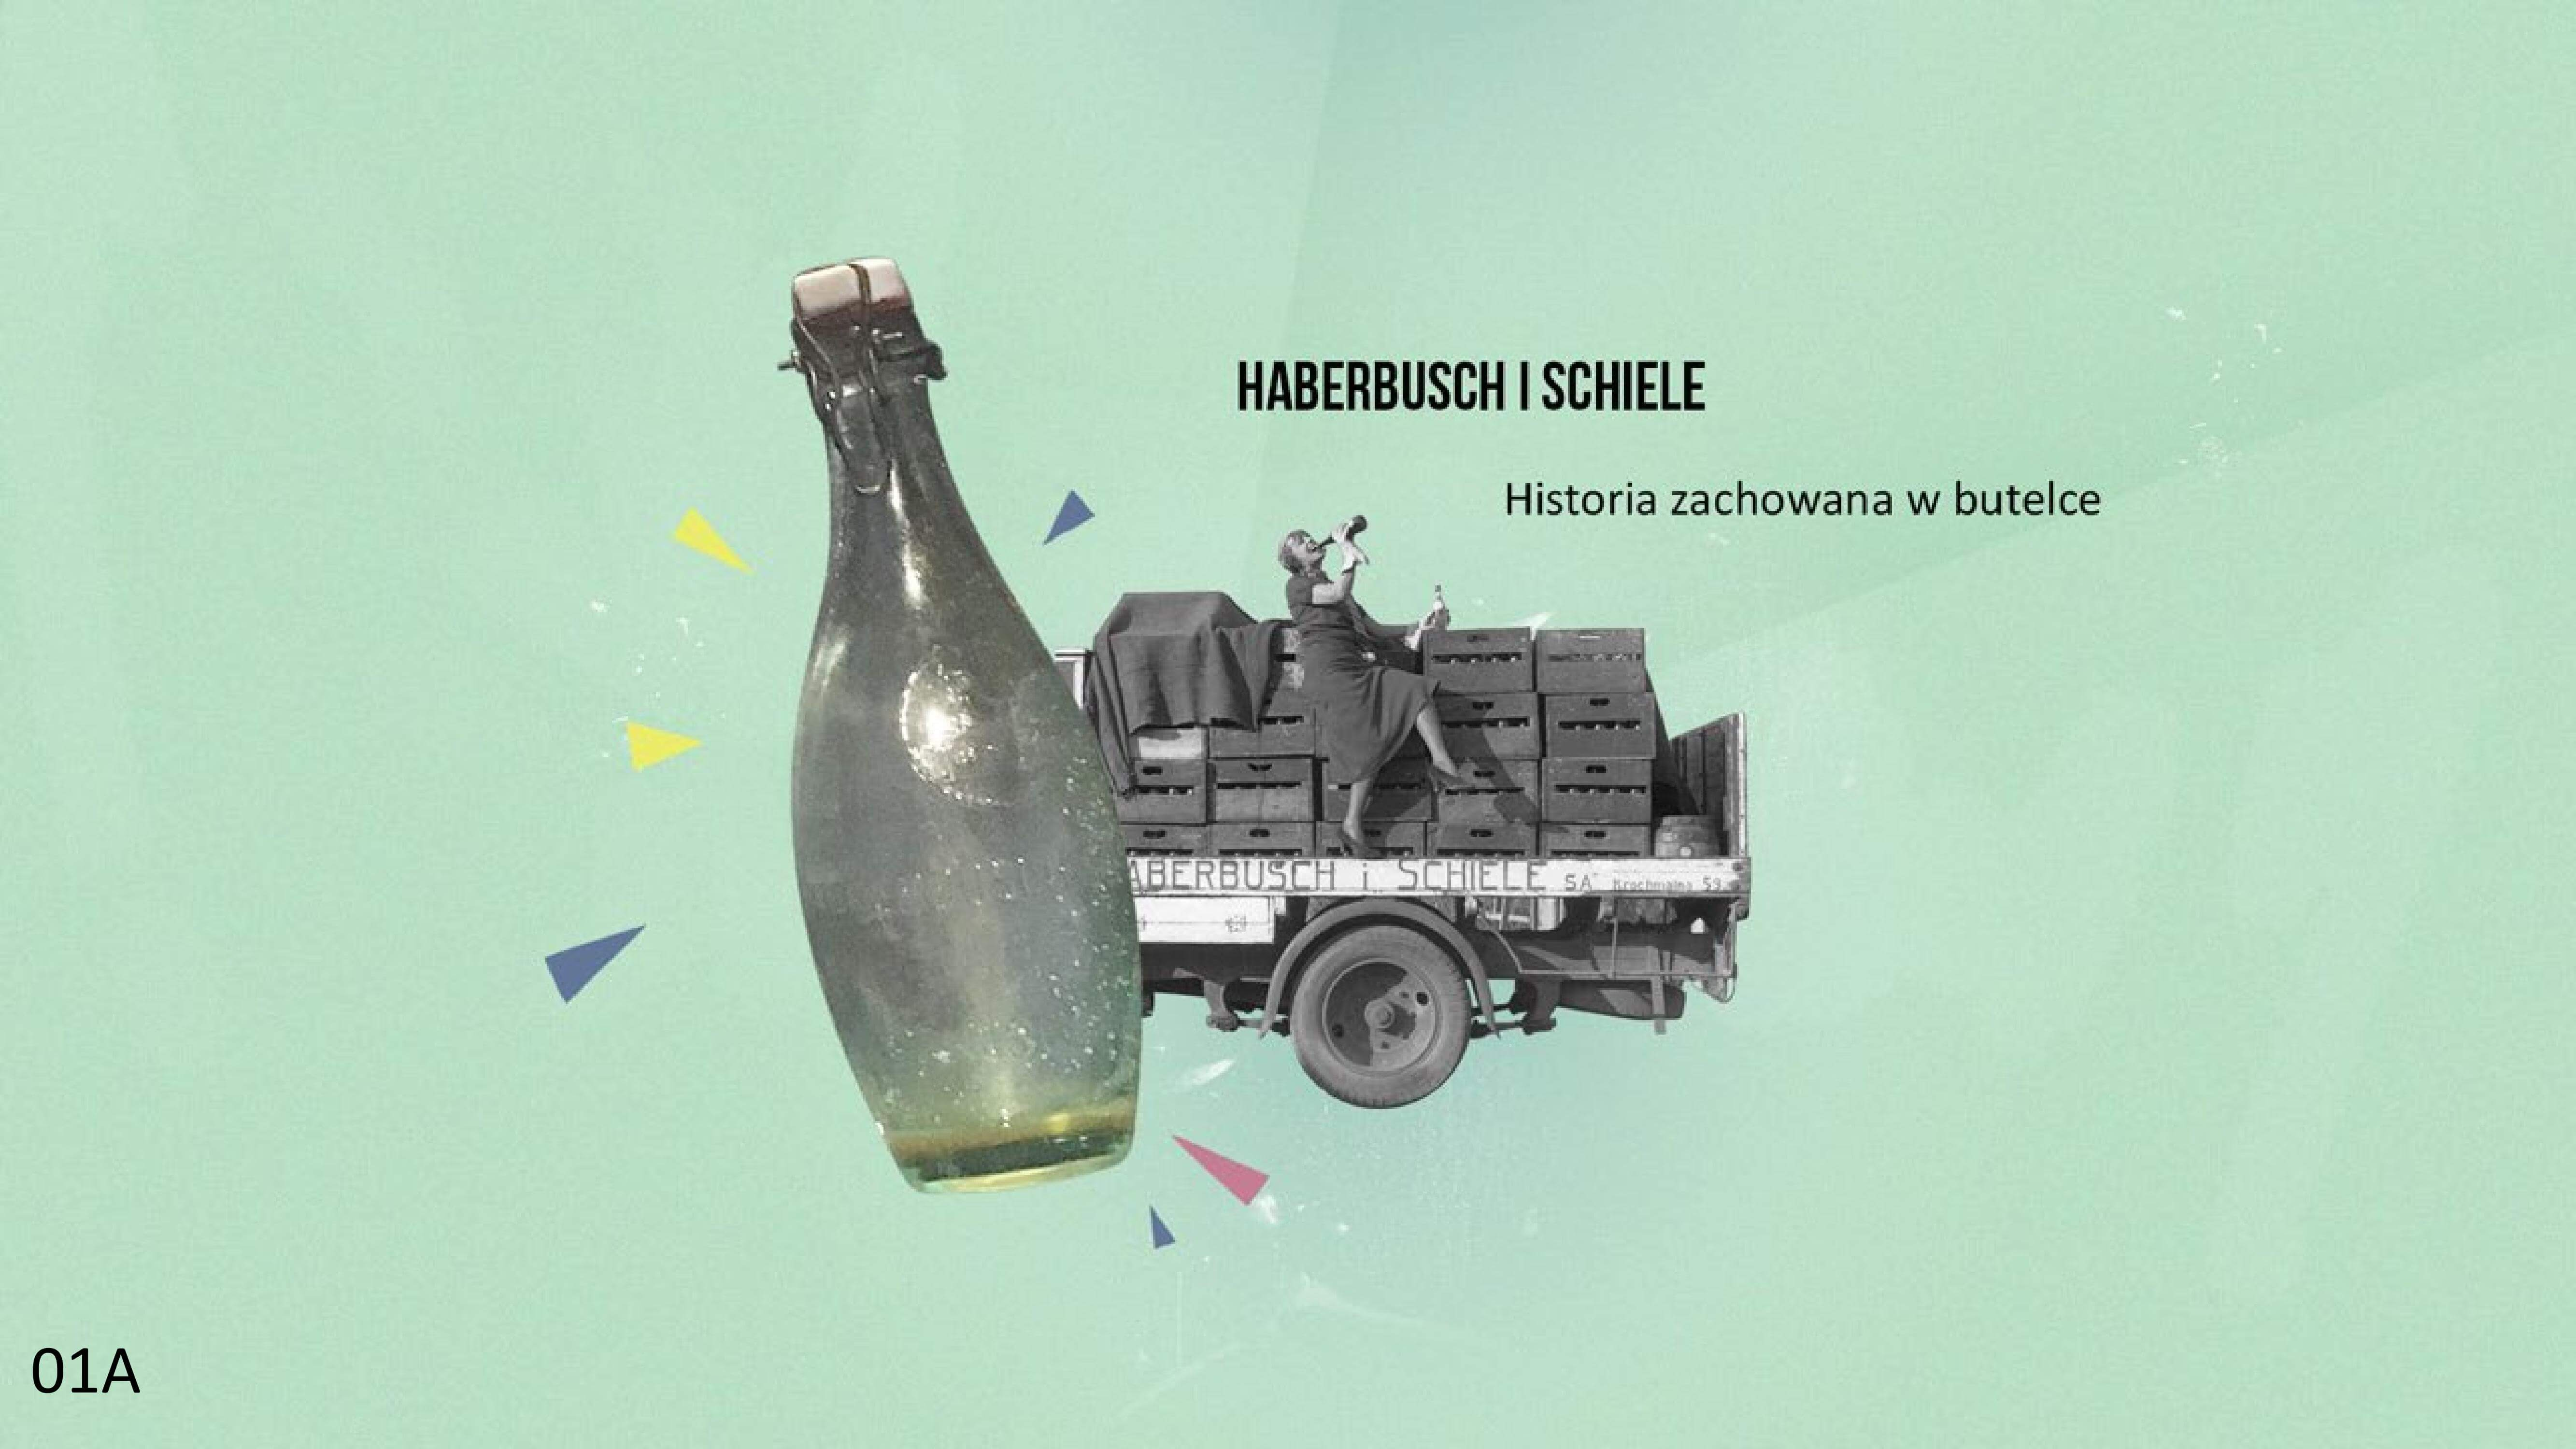 Haberbusch i Schiele